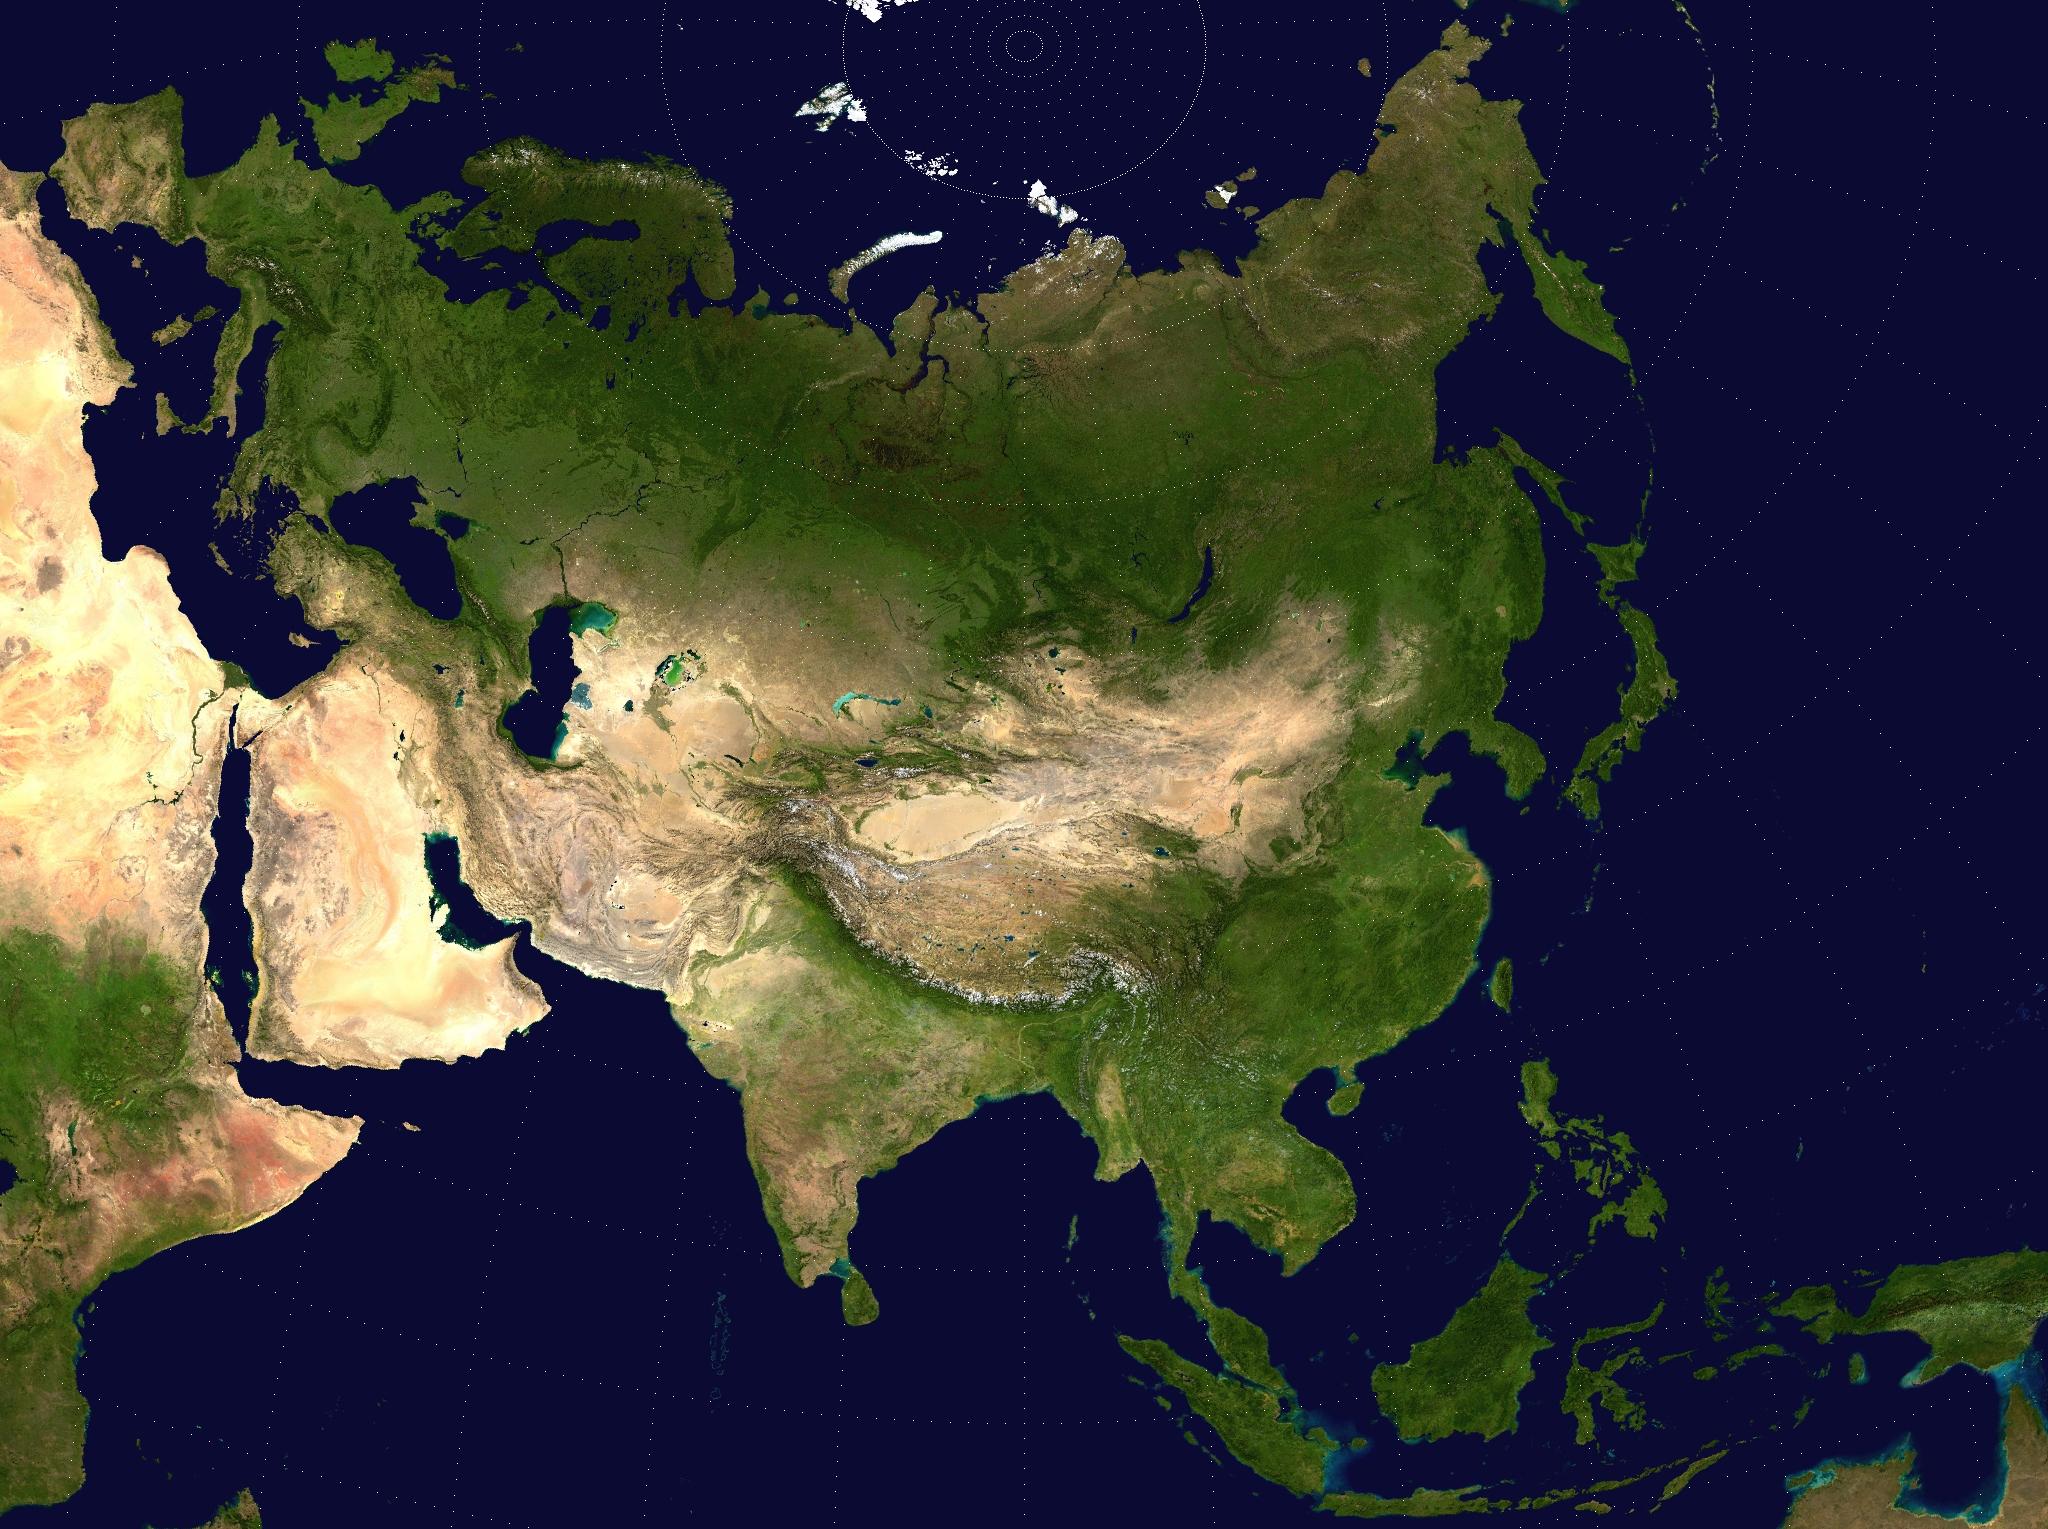 Google Map Of Asia.Large Detailed Satellite Map Of Asia Asia Large Detailed Satellite